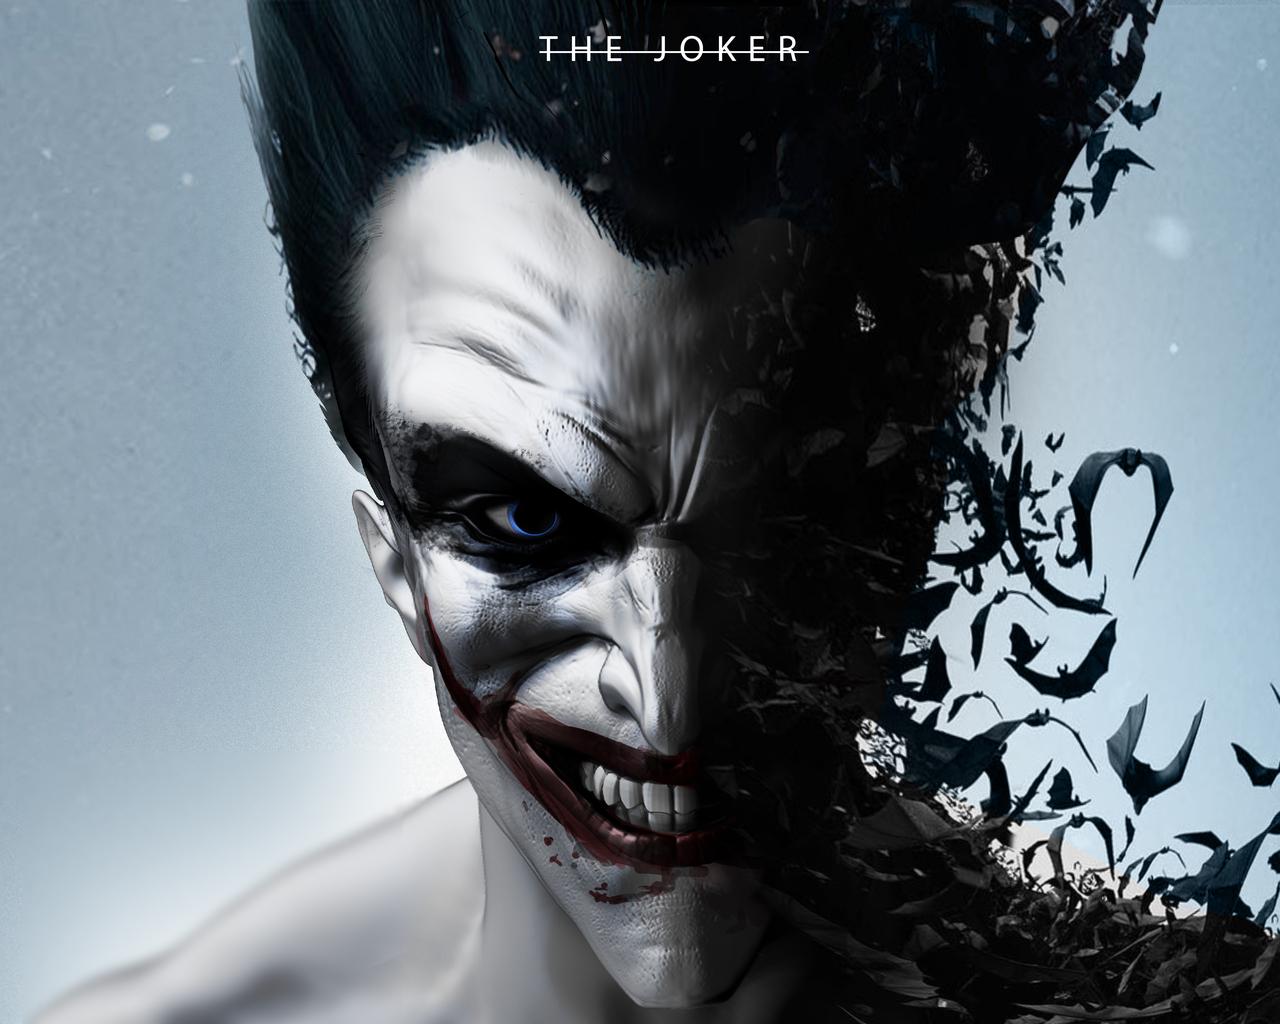 1280x1024 The Joker 1280x1024 Resolution HD 4k Wallpapers ...